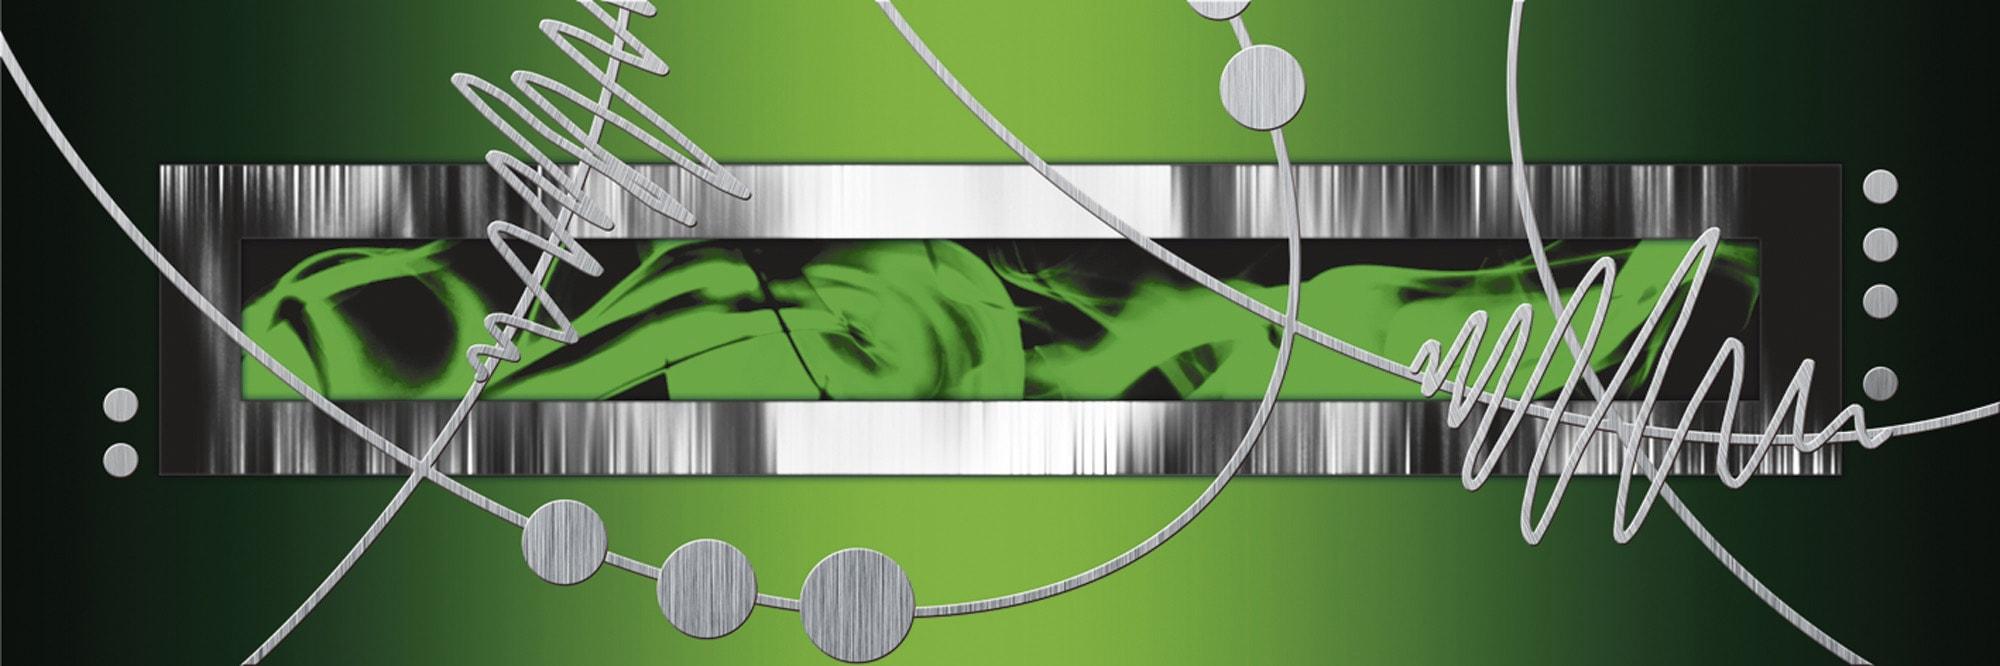 home affaire leinwandbild jule silber abstrakt auf gr n. Black Bedroom Furniture Sets. Home Design Ideas